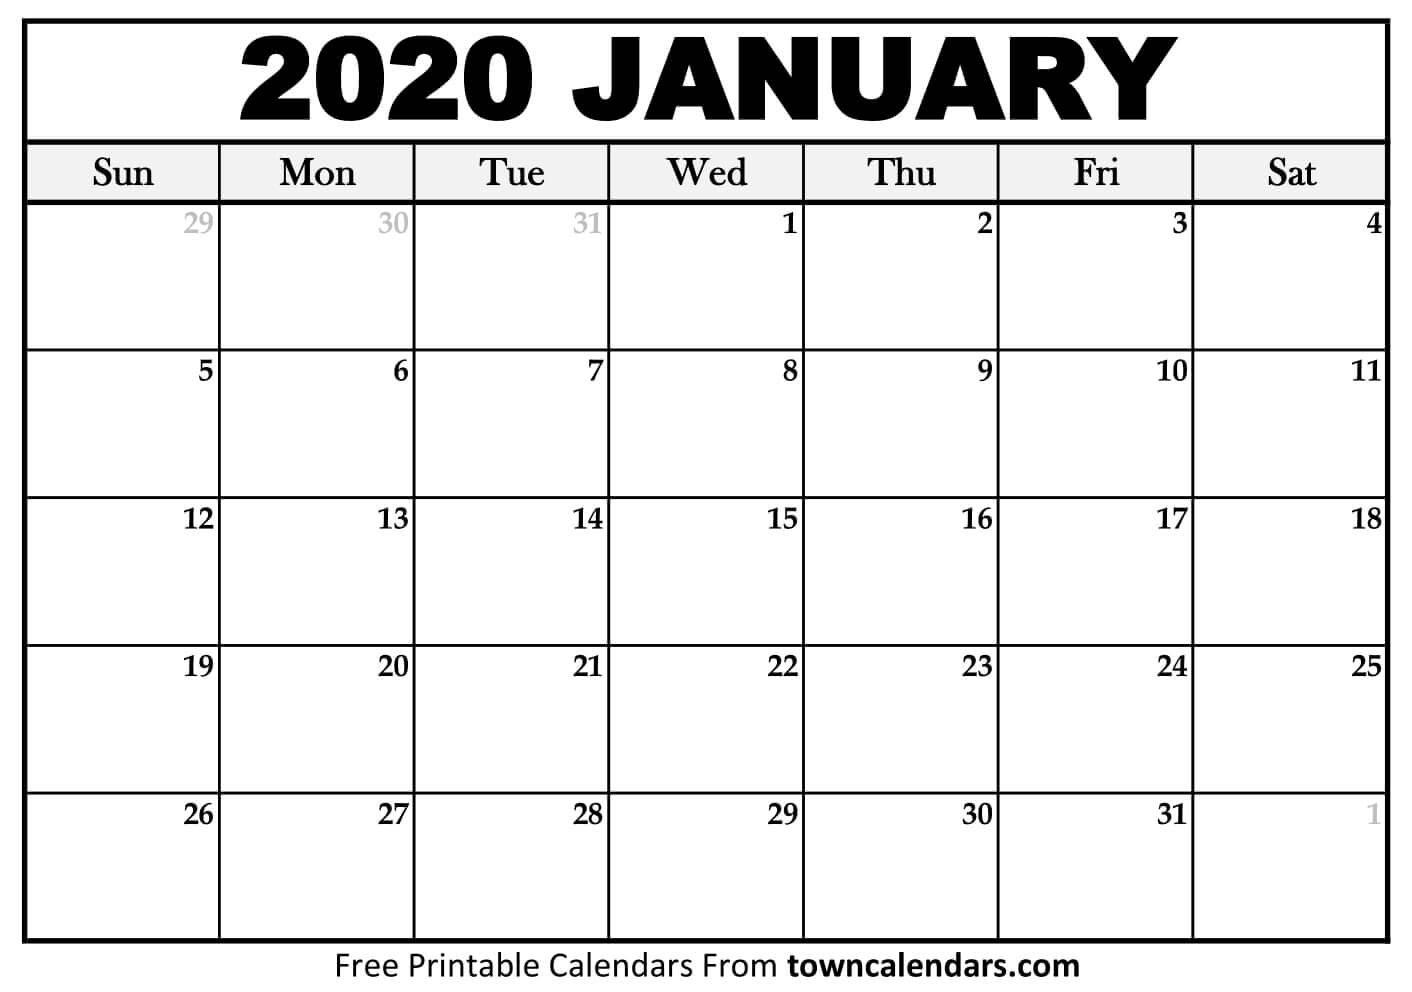 Print Calendar December 2020 And January 2020   Calendar intended for Free Printable December January Calendar Graphics